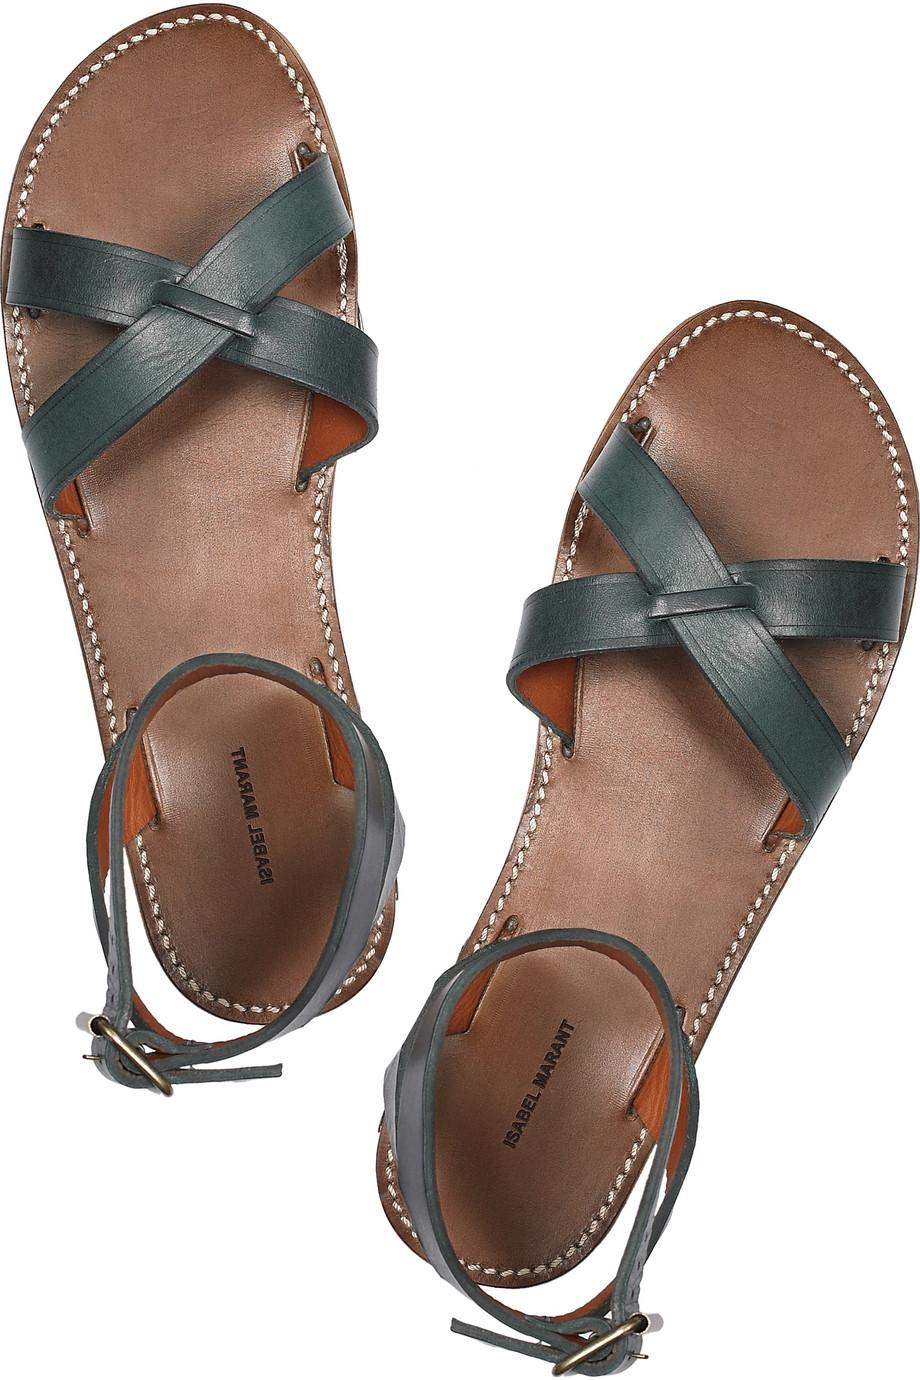 637c7c0de907b Lyst - Isabel Marant Merry Leather Sandals in Green